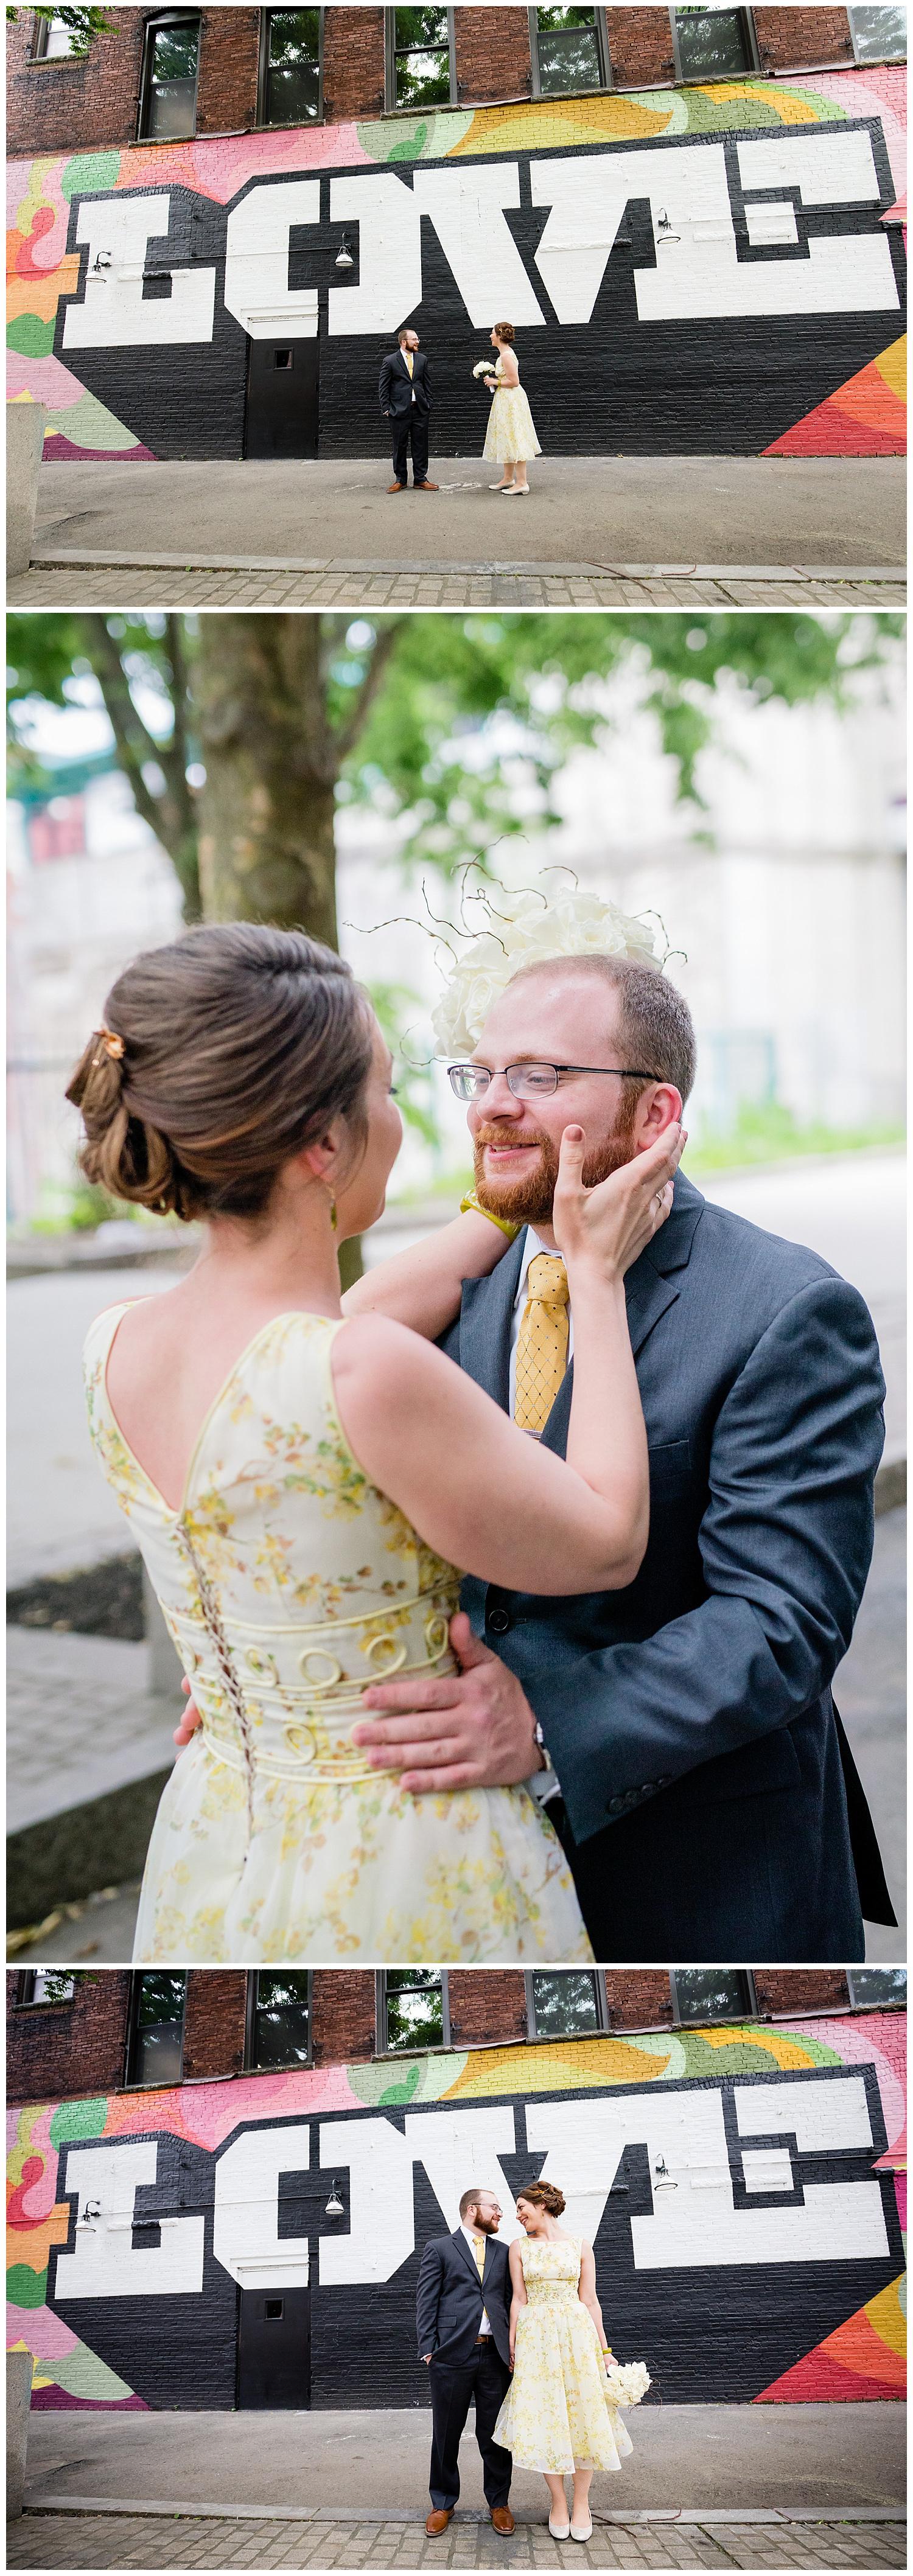 Lynn-Musuem-Wedding-Boston-Photographer-26-North-Studios-006.jpg